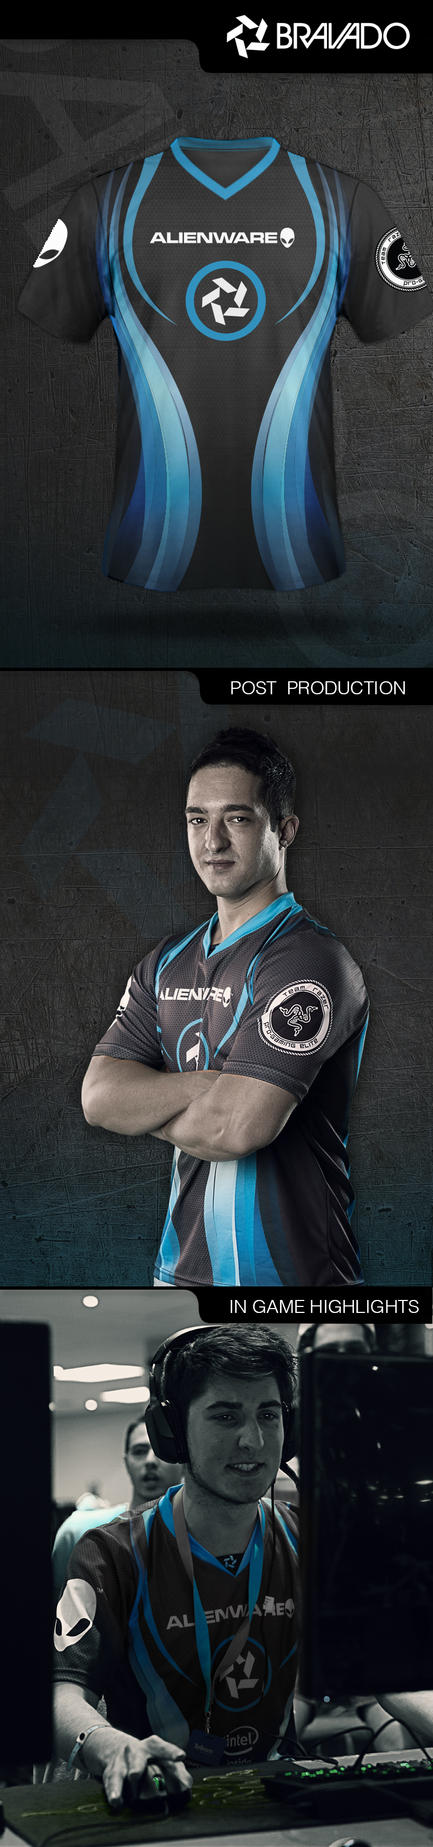 E Sports - Bravado Gaming by rawn-za